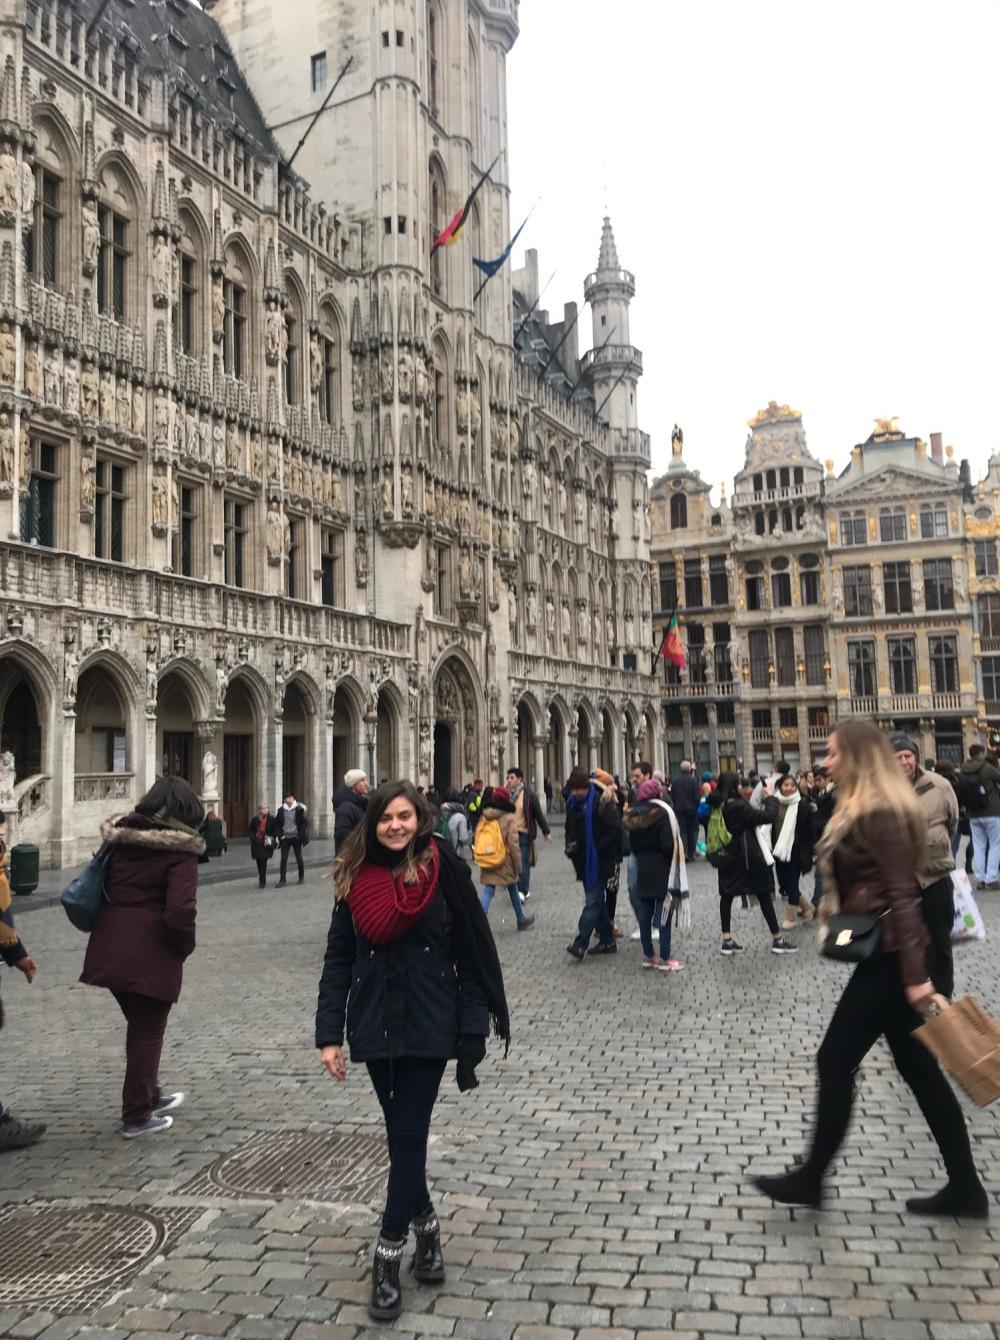 Bruxelas e a Grande Place